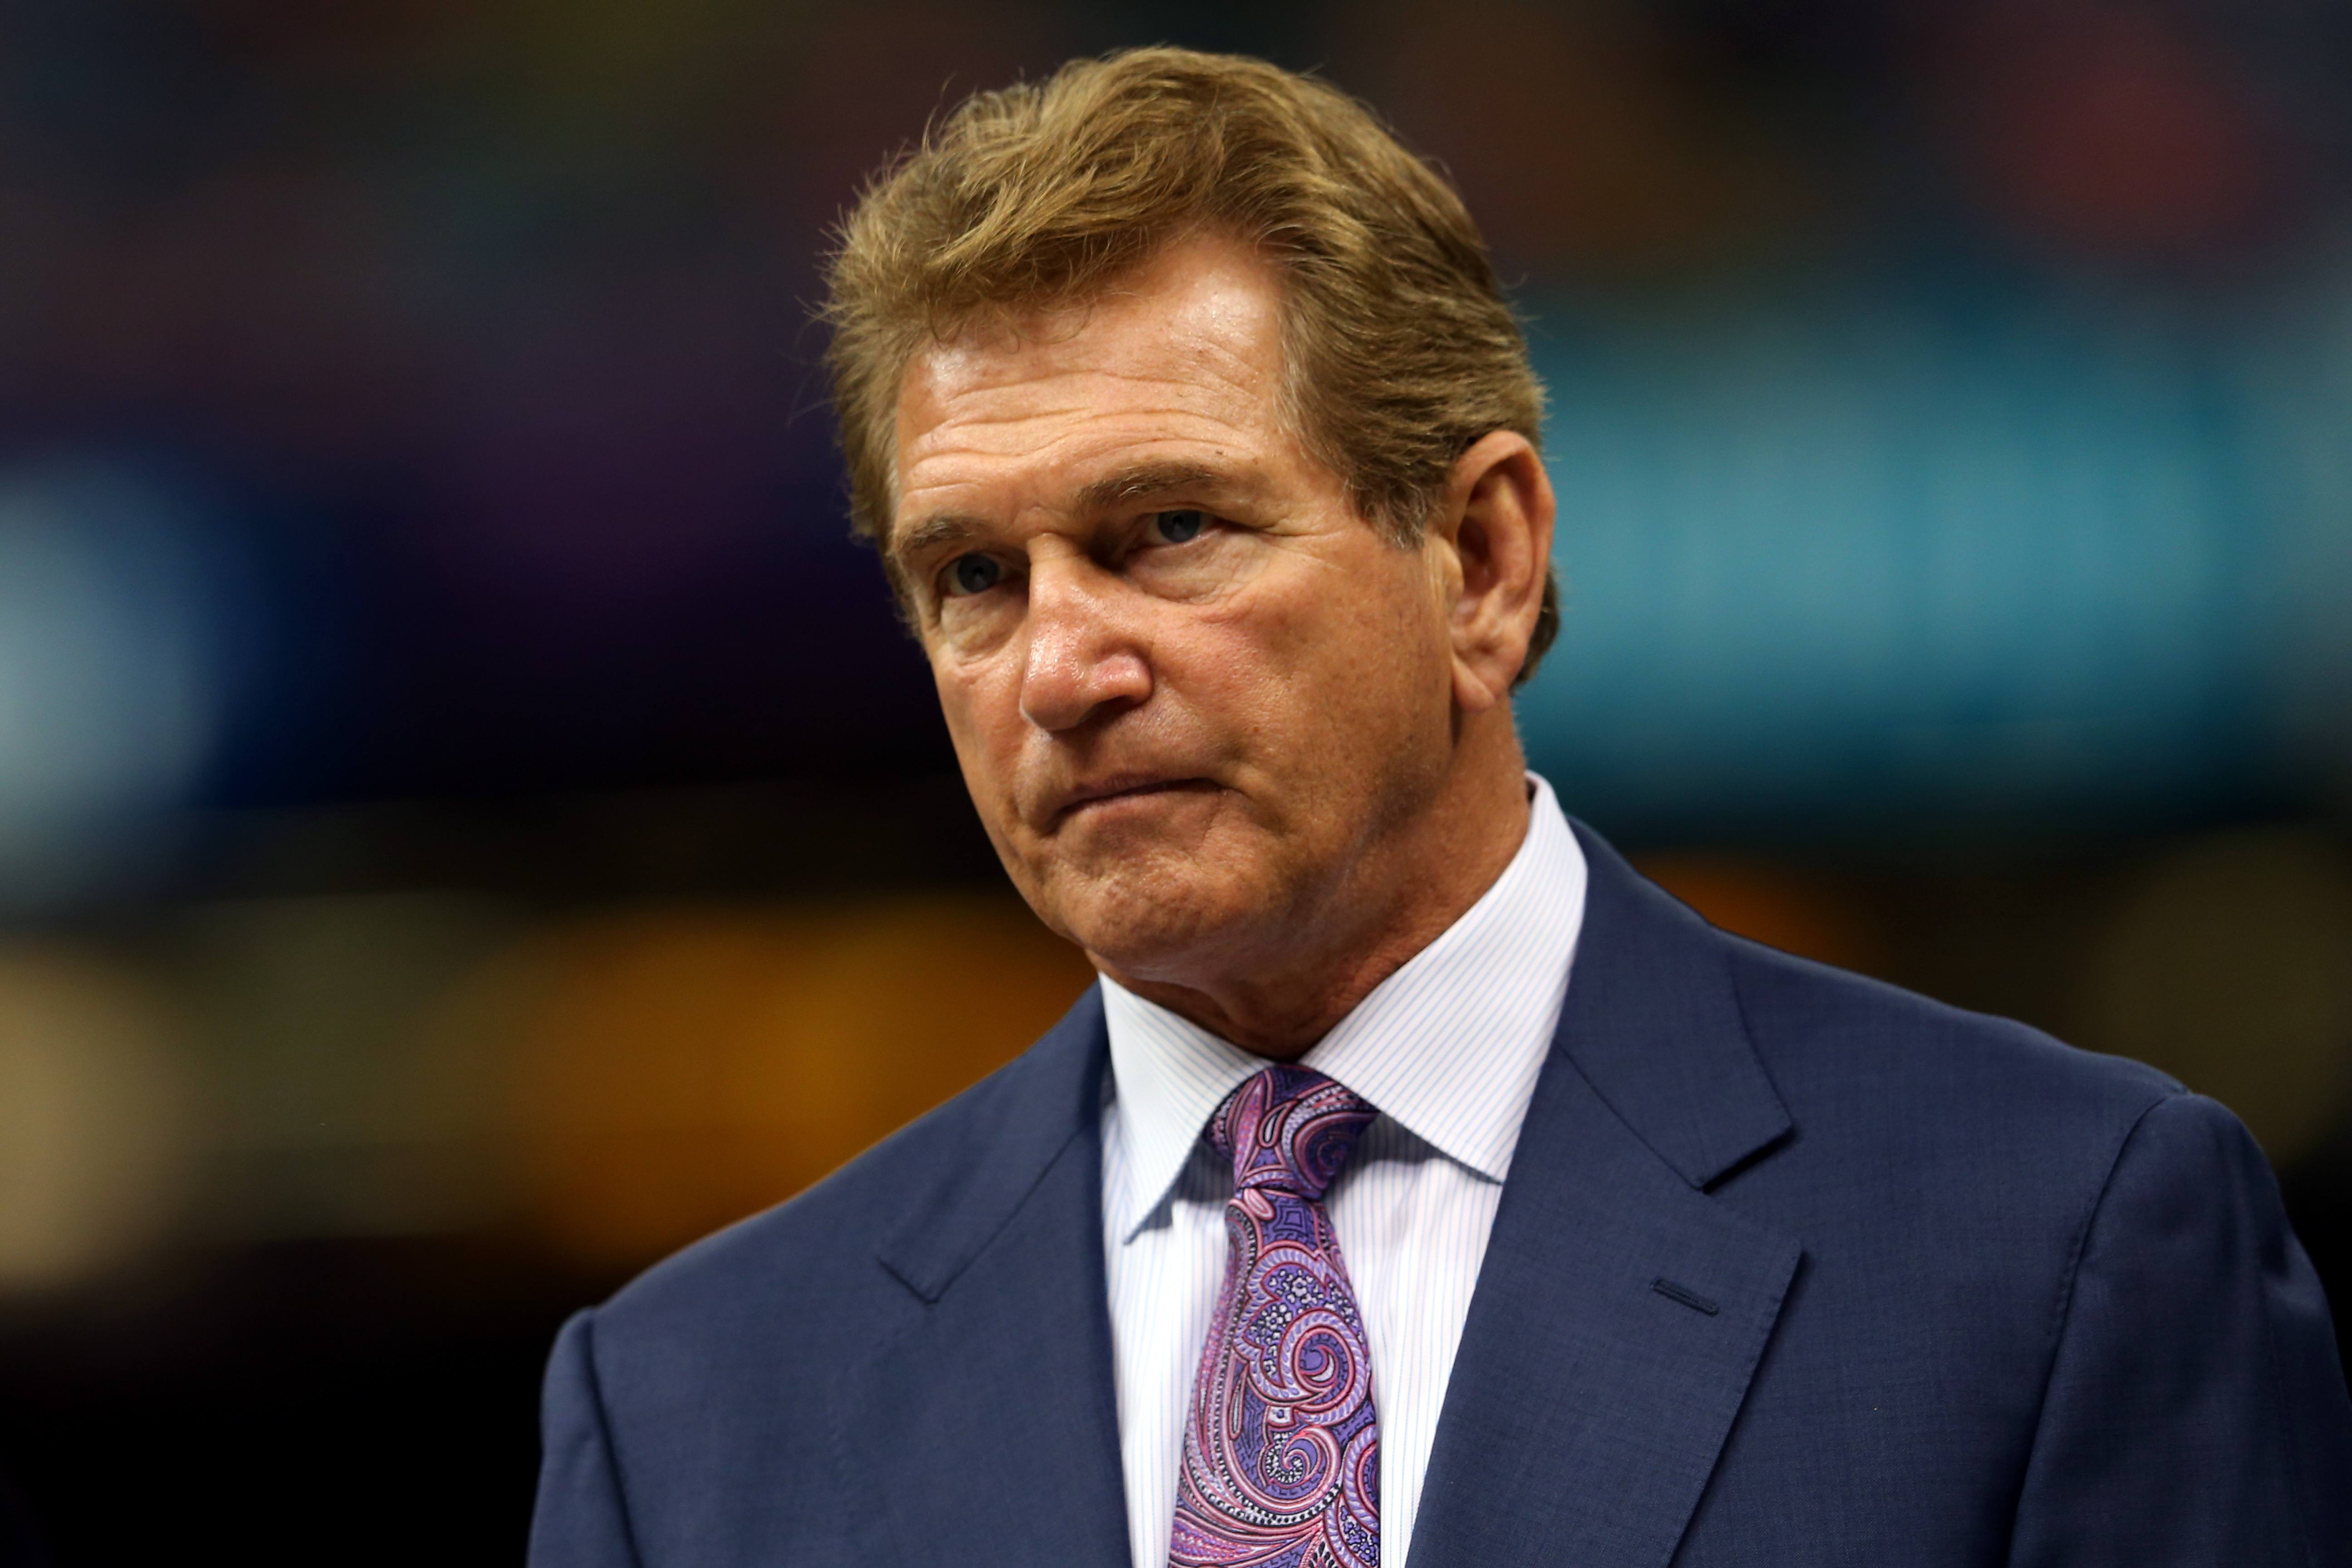 Former professional football player Joe Theismann. / Mike Ehrmann, Getty Images